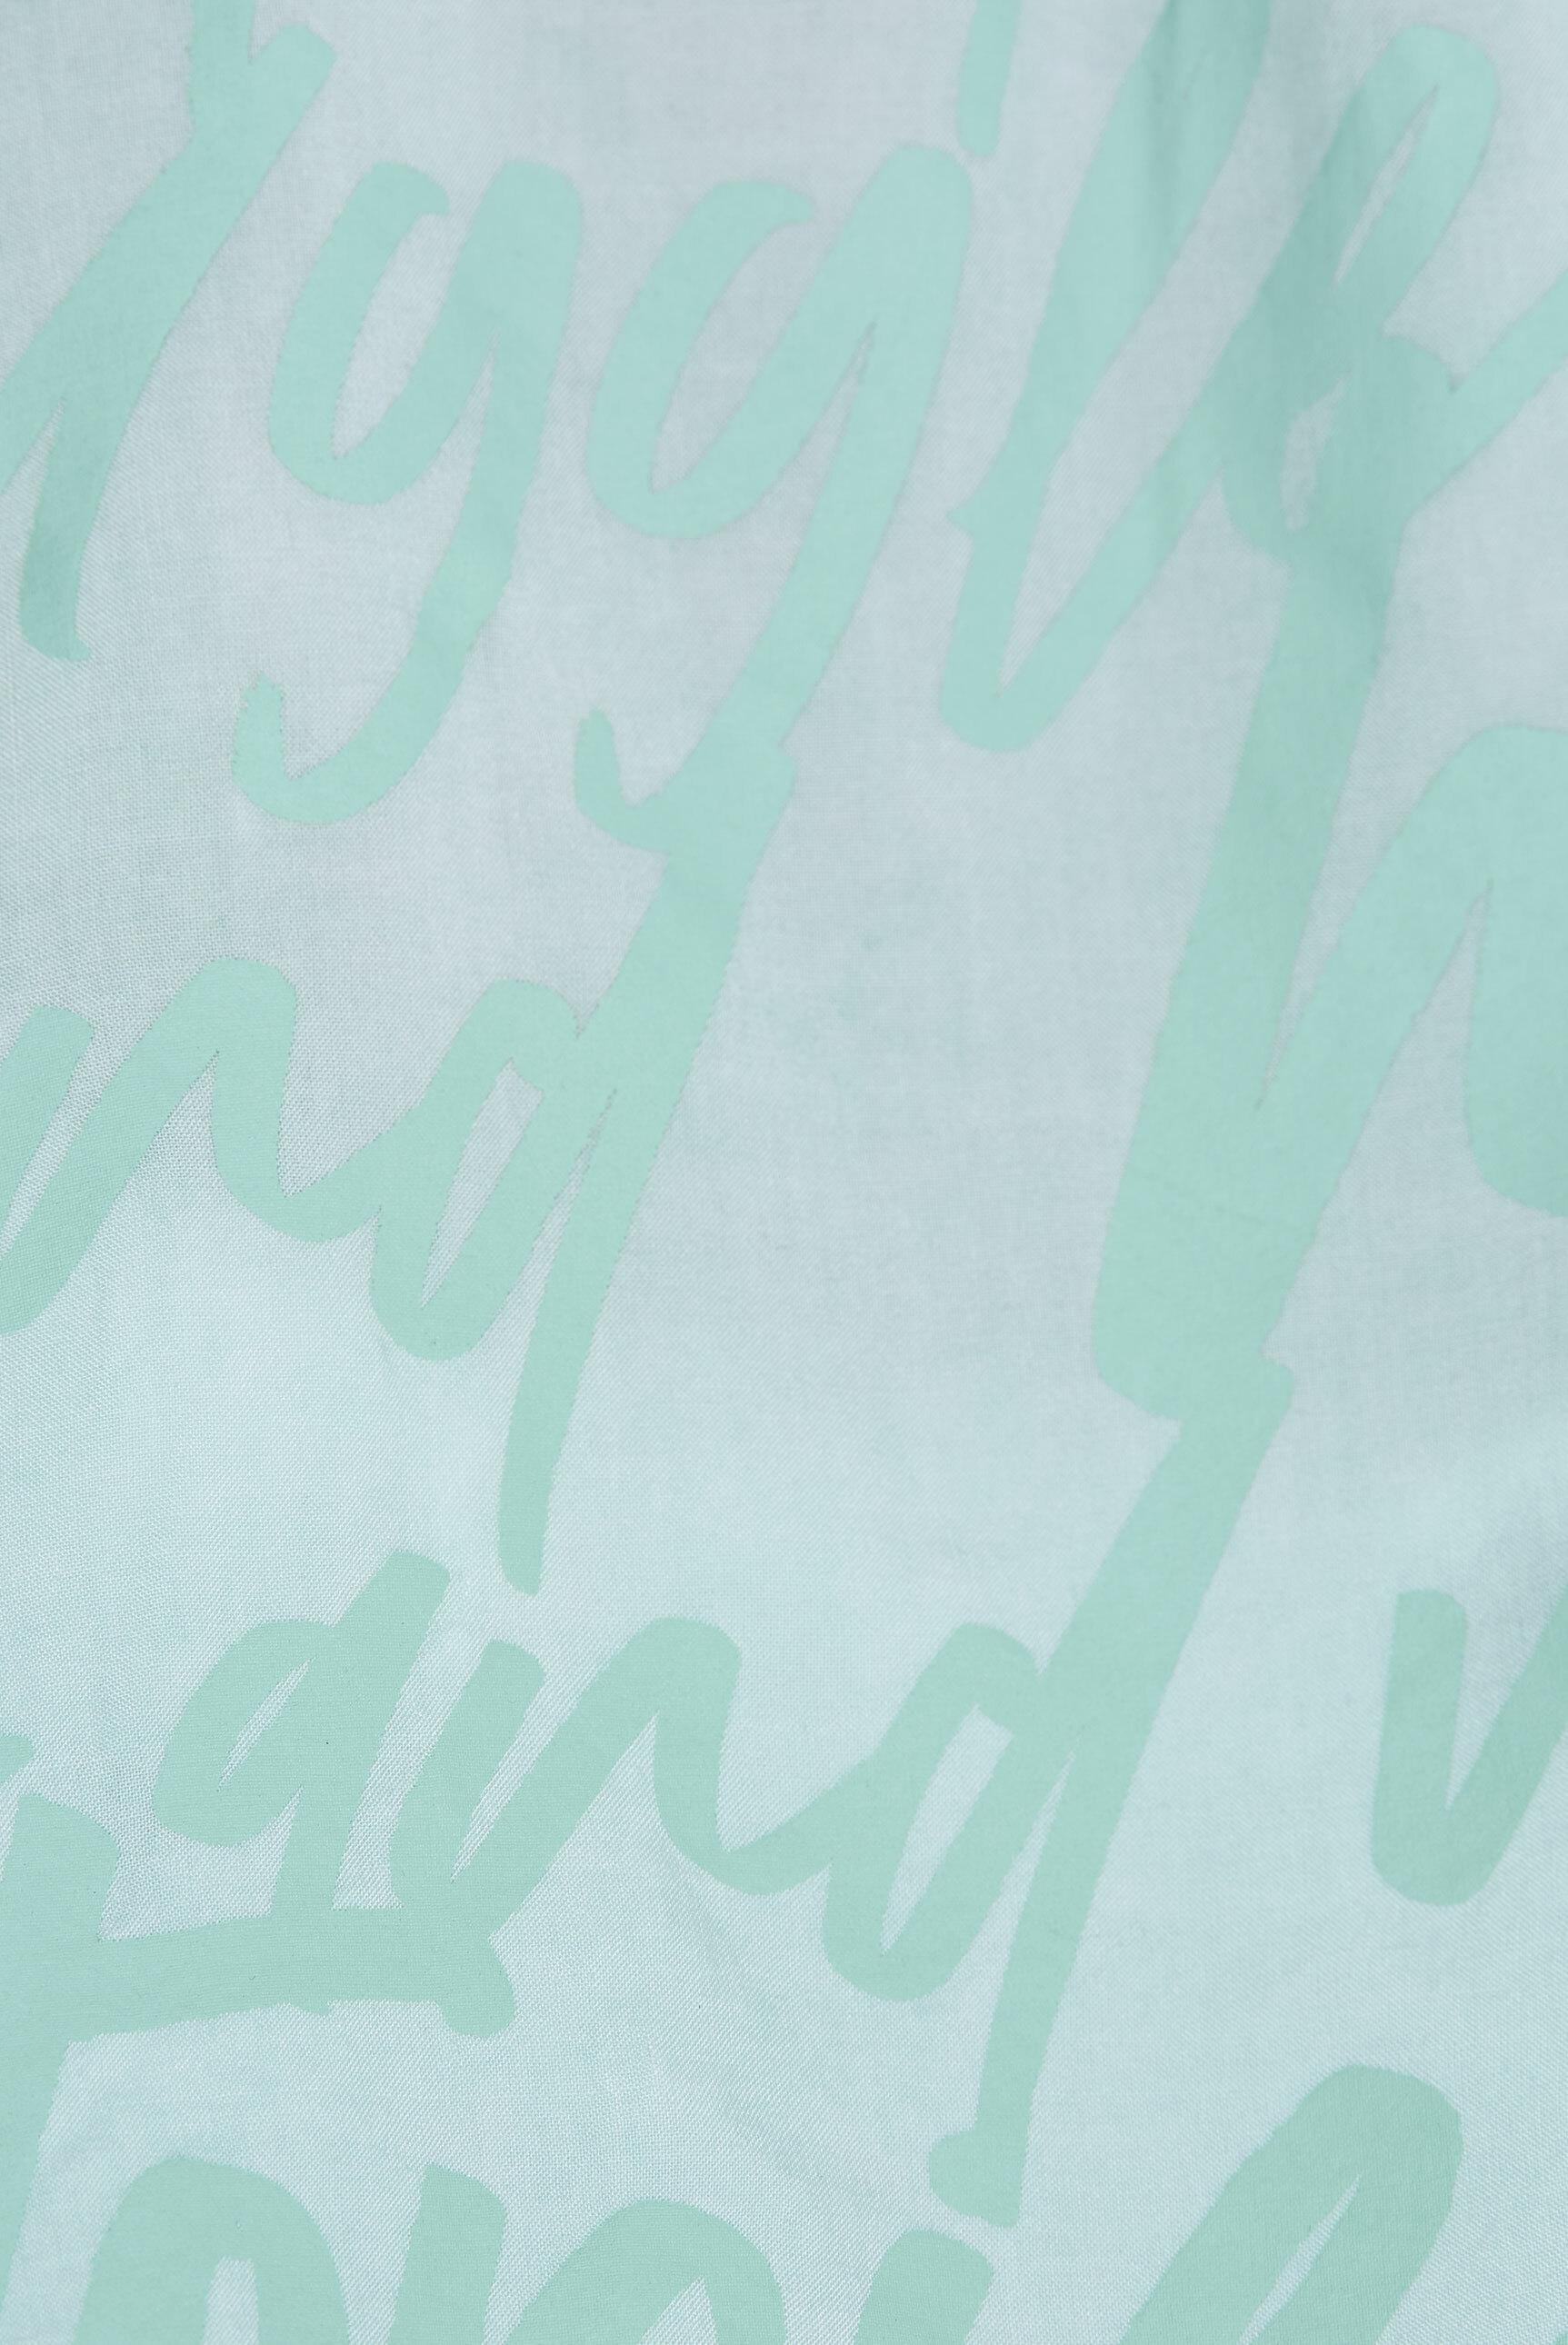 Ärmellose Bluse mit Wording Prints